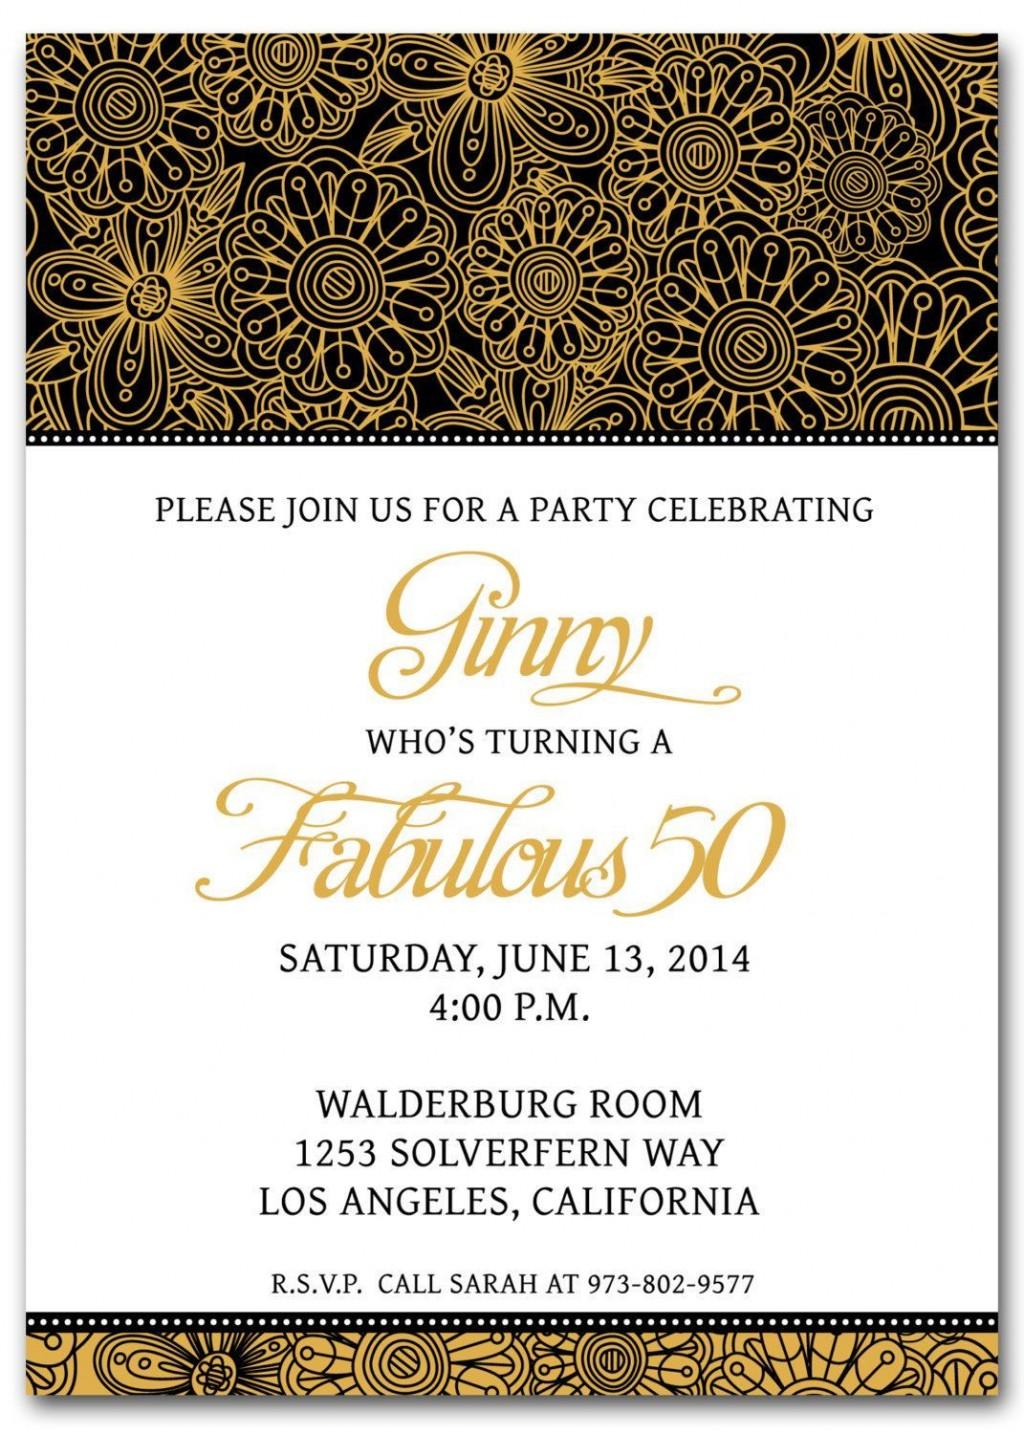 001 Breathtaking 50th Anniversary Invitation Template Free Download Highest Quality  Golden WeddingLarge